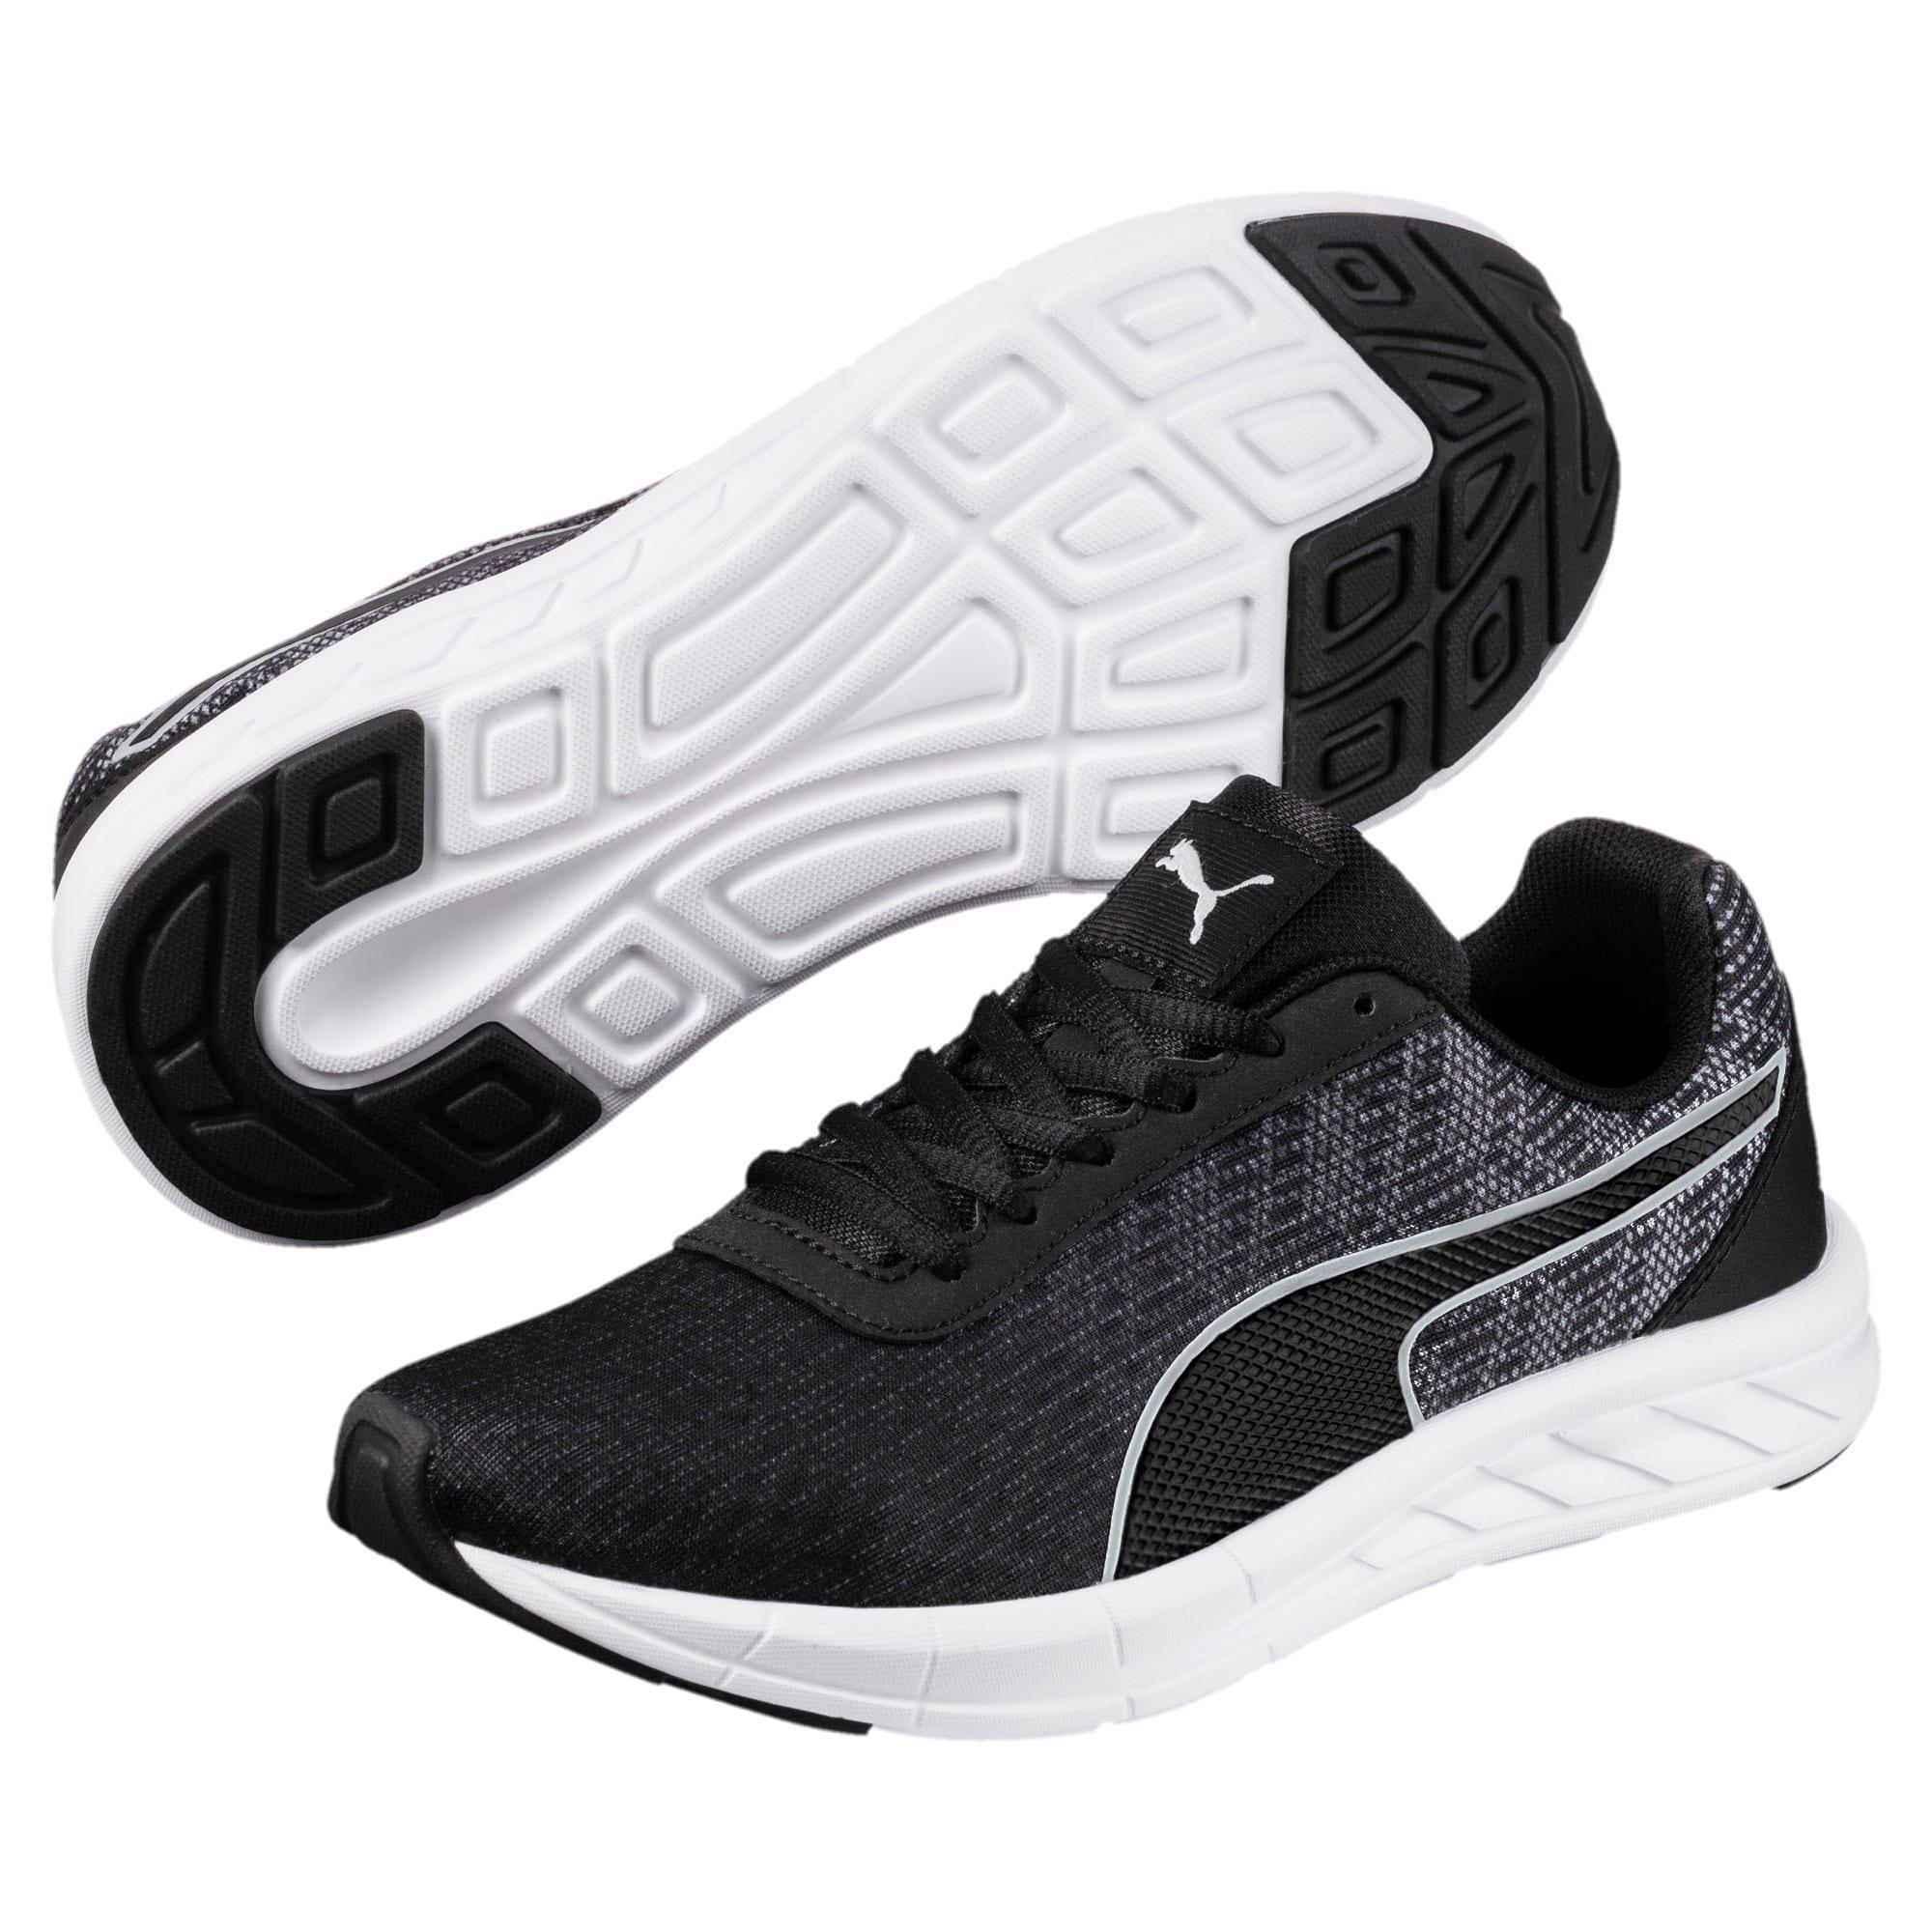 Thumbnail 2 of Comet Kids' Running Shoes, Quarry-Puma Black, medium-IND